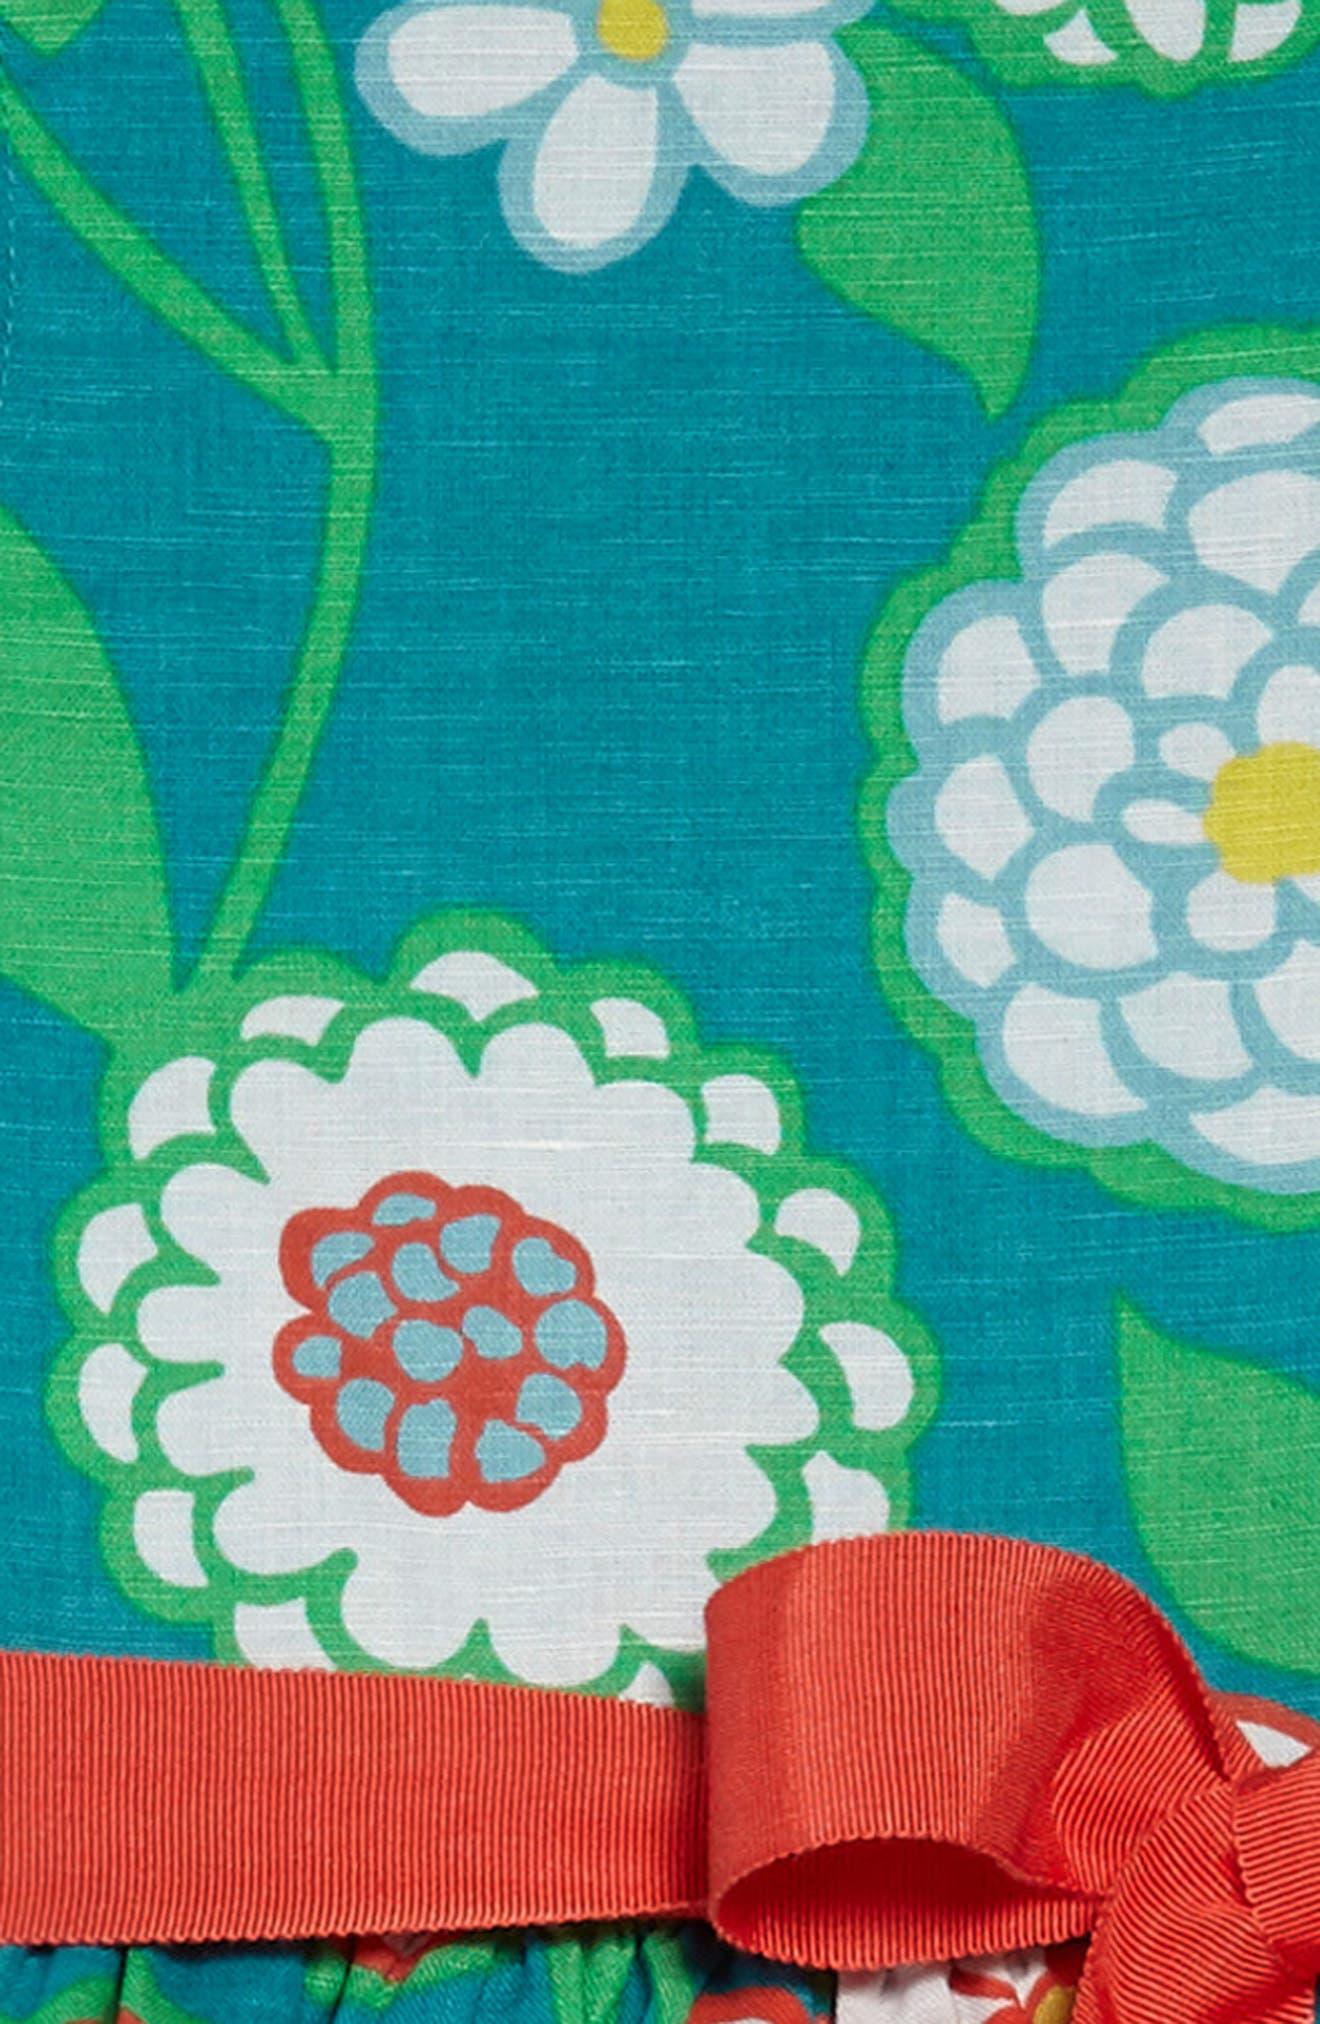 Vintage Linen & Cotton Dress,                             Alternate thumbnail 3, color,                             ULTRAMARINE GREEN DAISY GRN